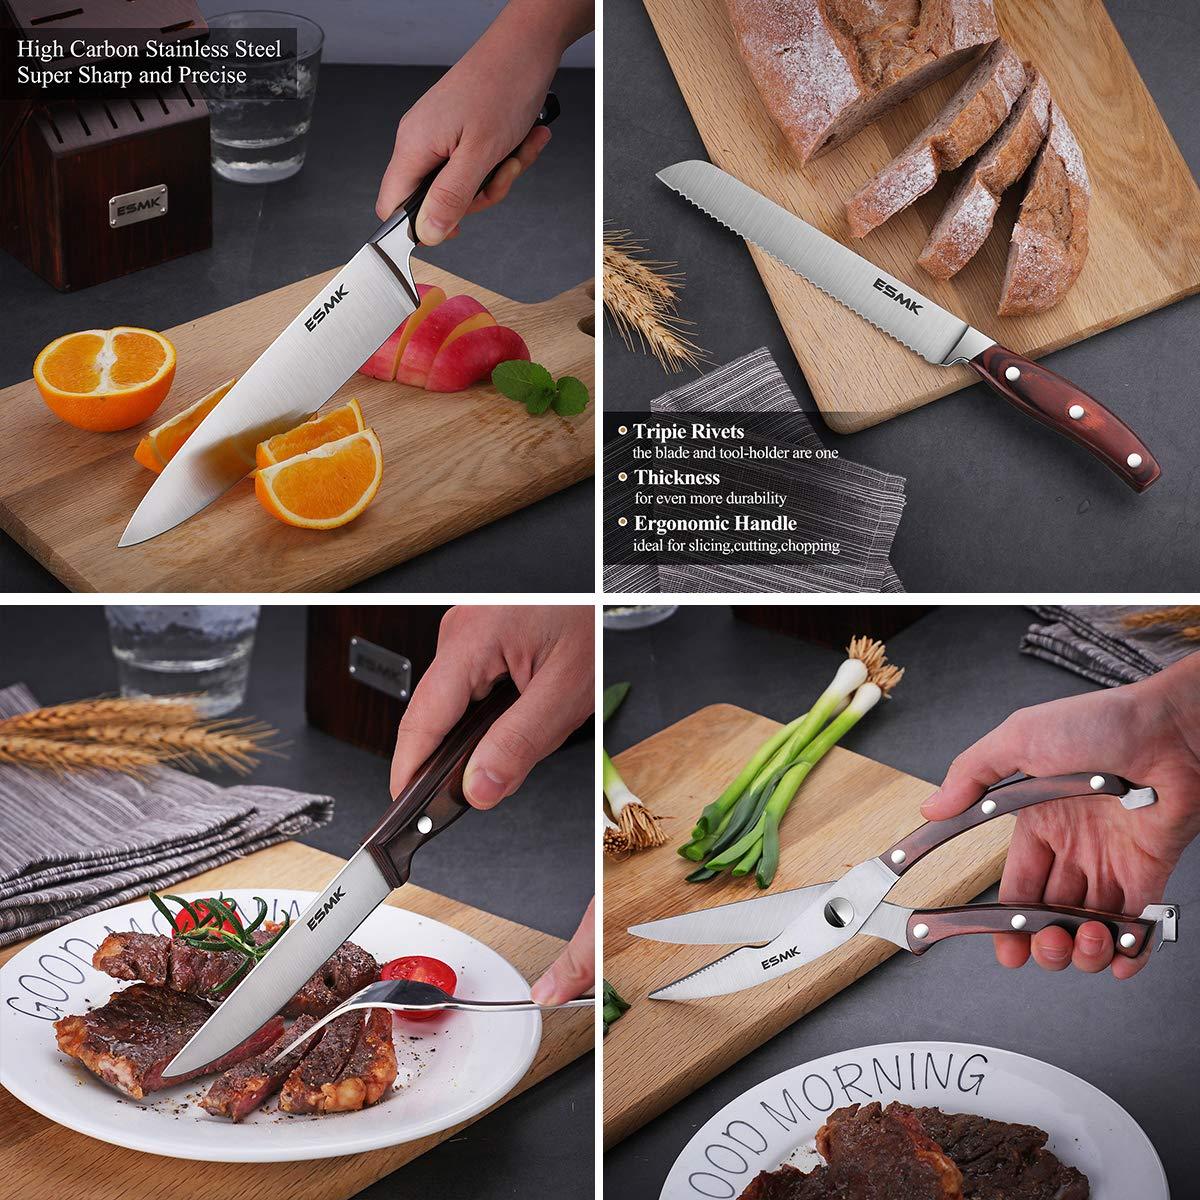 Knife Set, 15-Piece Kitchen Knife Set with Block Wooden, Manual Sharpening for Chef Knife Block Set, German Stainless Steel, ESMK (15 PCs Knife Block Set) by ESMK (Image #7)